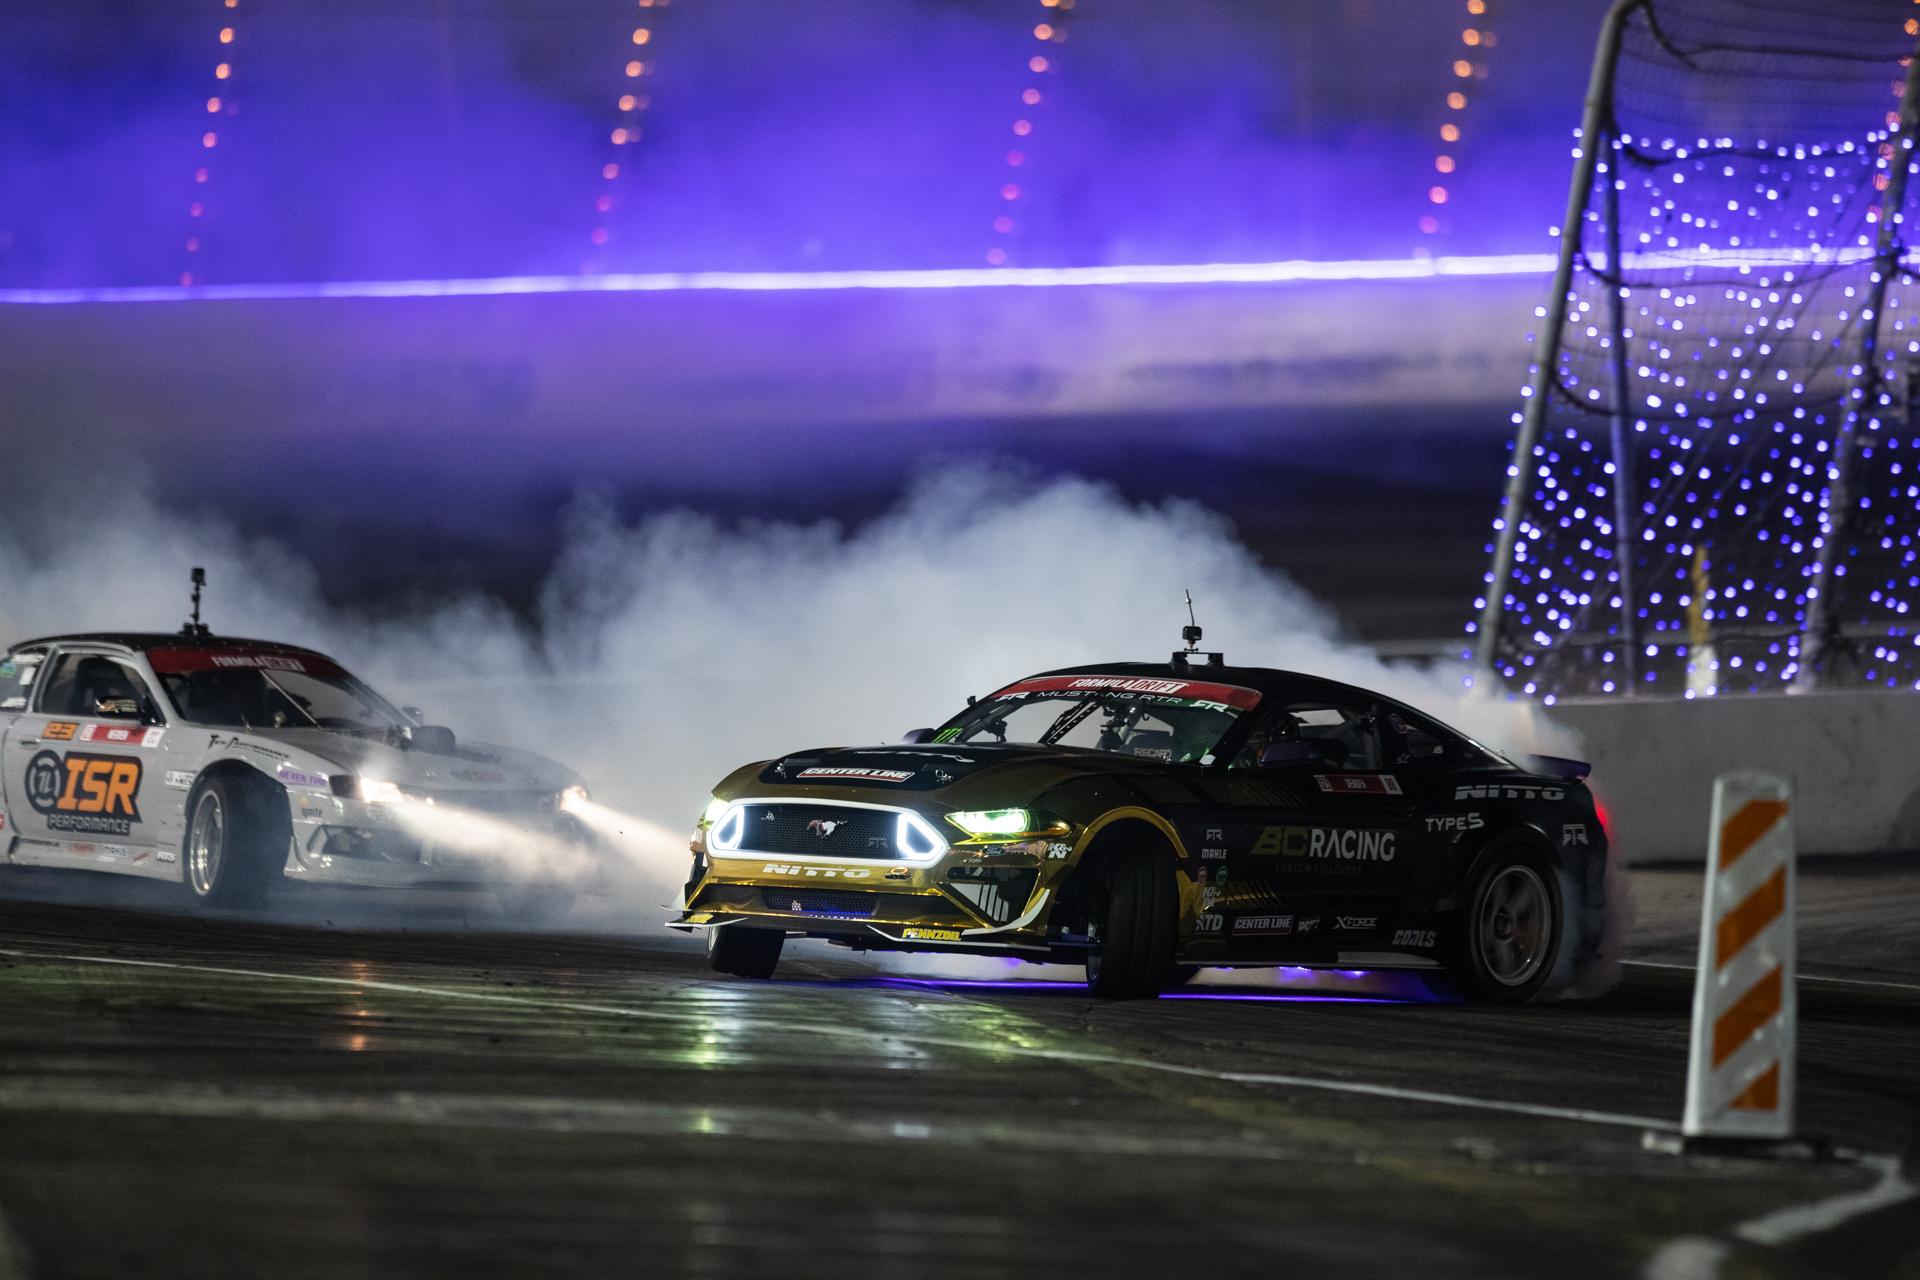 BC Racing Chelsea Denofa tandem drift leading night